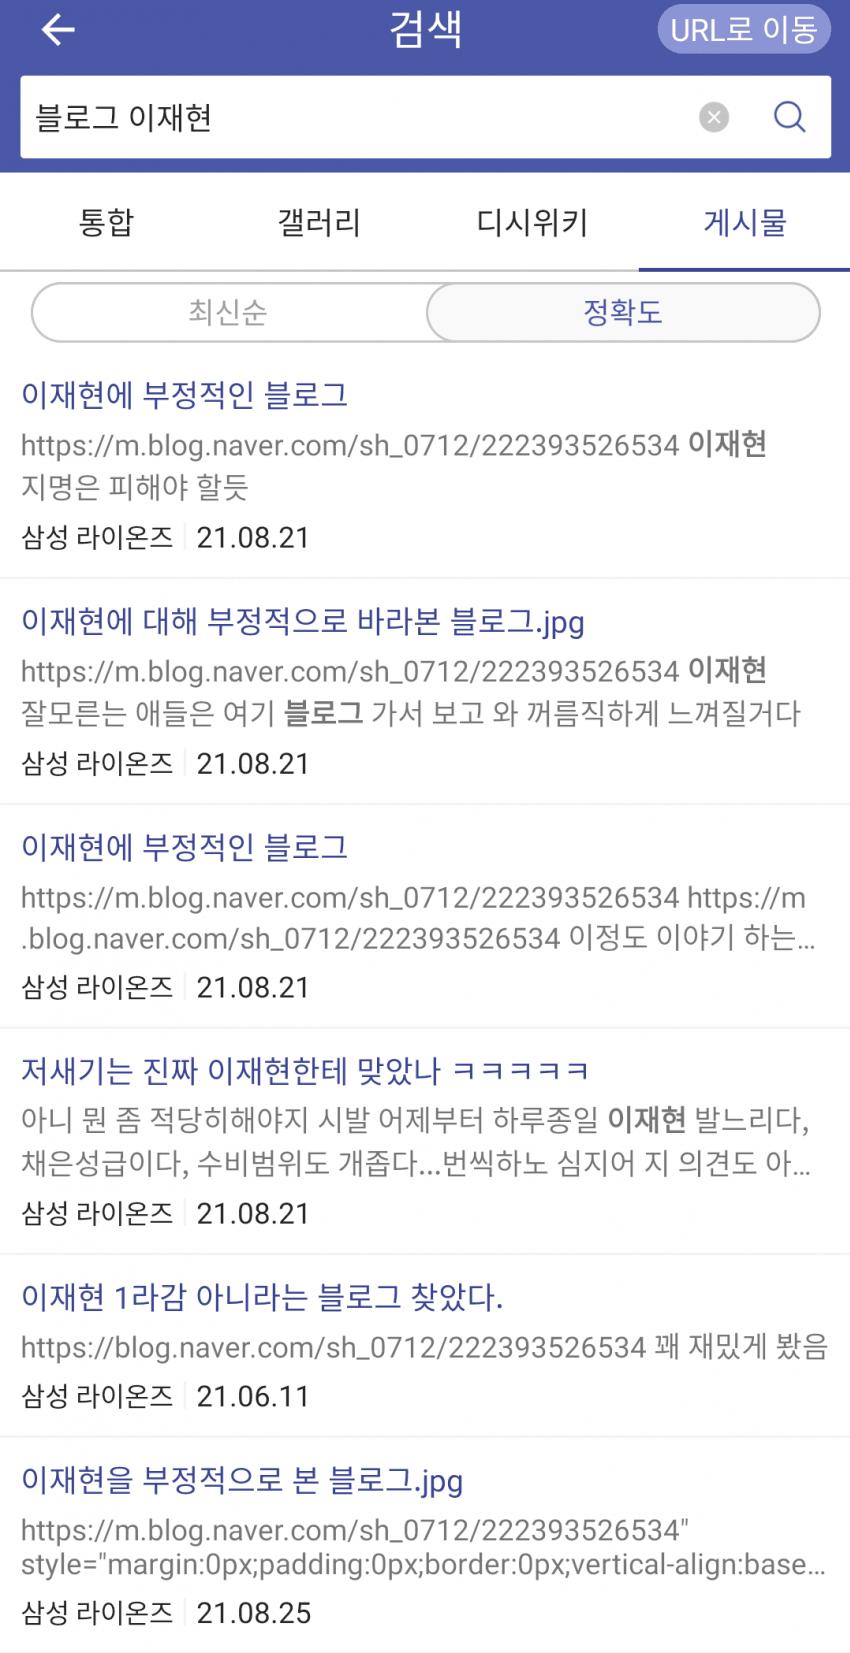 viewimage.php?id=3ebcdd35f0dc3faa67b0d8a629df212a&no=24b0d769e1d32ca73deb87fa11d02831de04ca5aee4f7f339edb1c2bd9467836ee03c2dfe1846cbce47f78ba9537bc38c0dad4b2d07dac1247ecc9c0f3ac2632a1e34da54b628e9d25cce296d0824d6aa13e1c32778adae76d50ad599106d71af3b5dad998deba7eaa